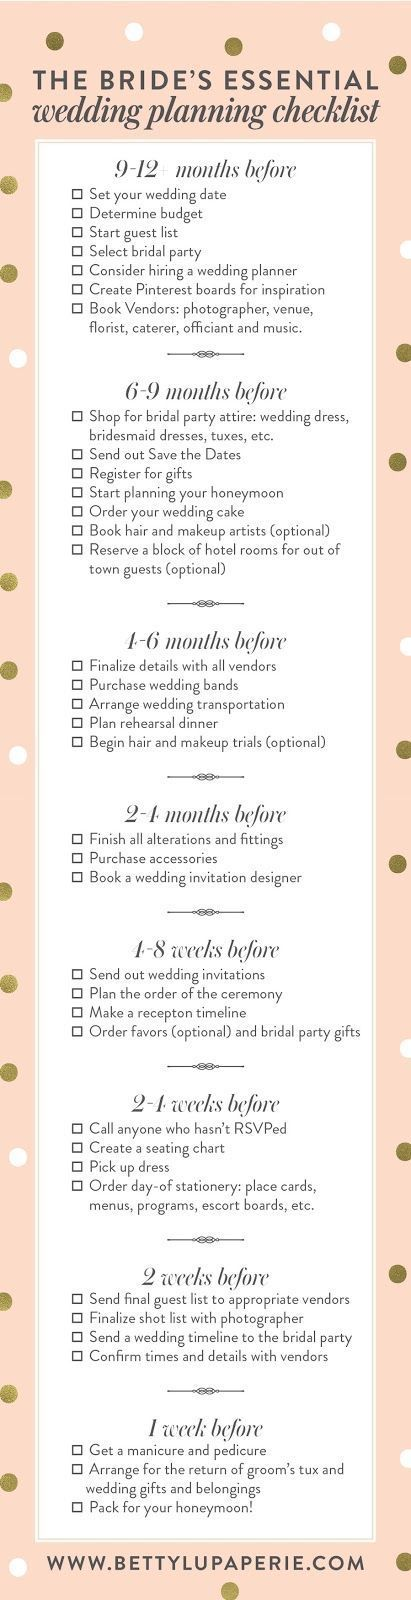 wedding planning checklist best photos - wedding planning  - cuteweddingideas.com